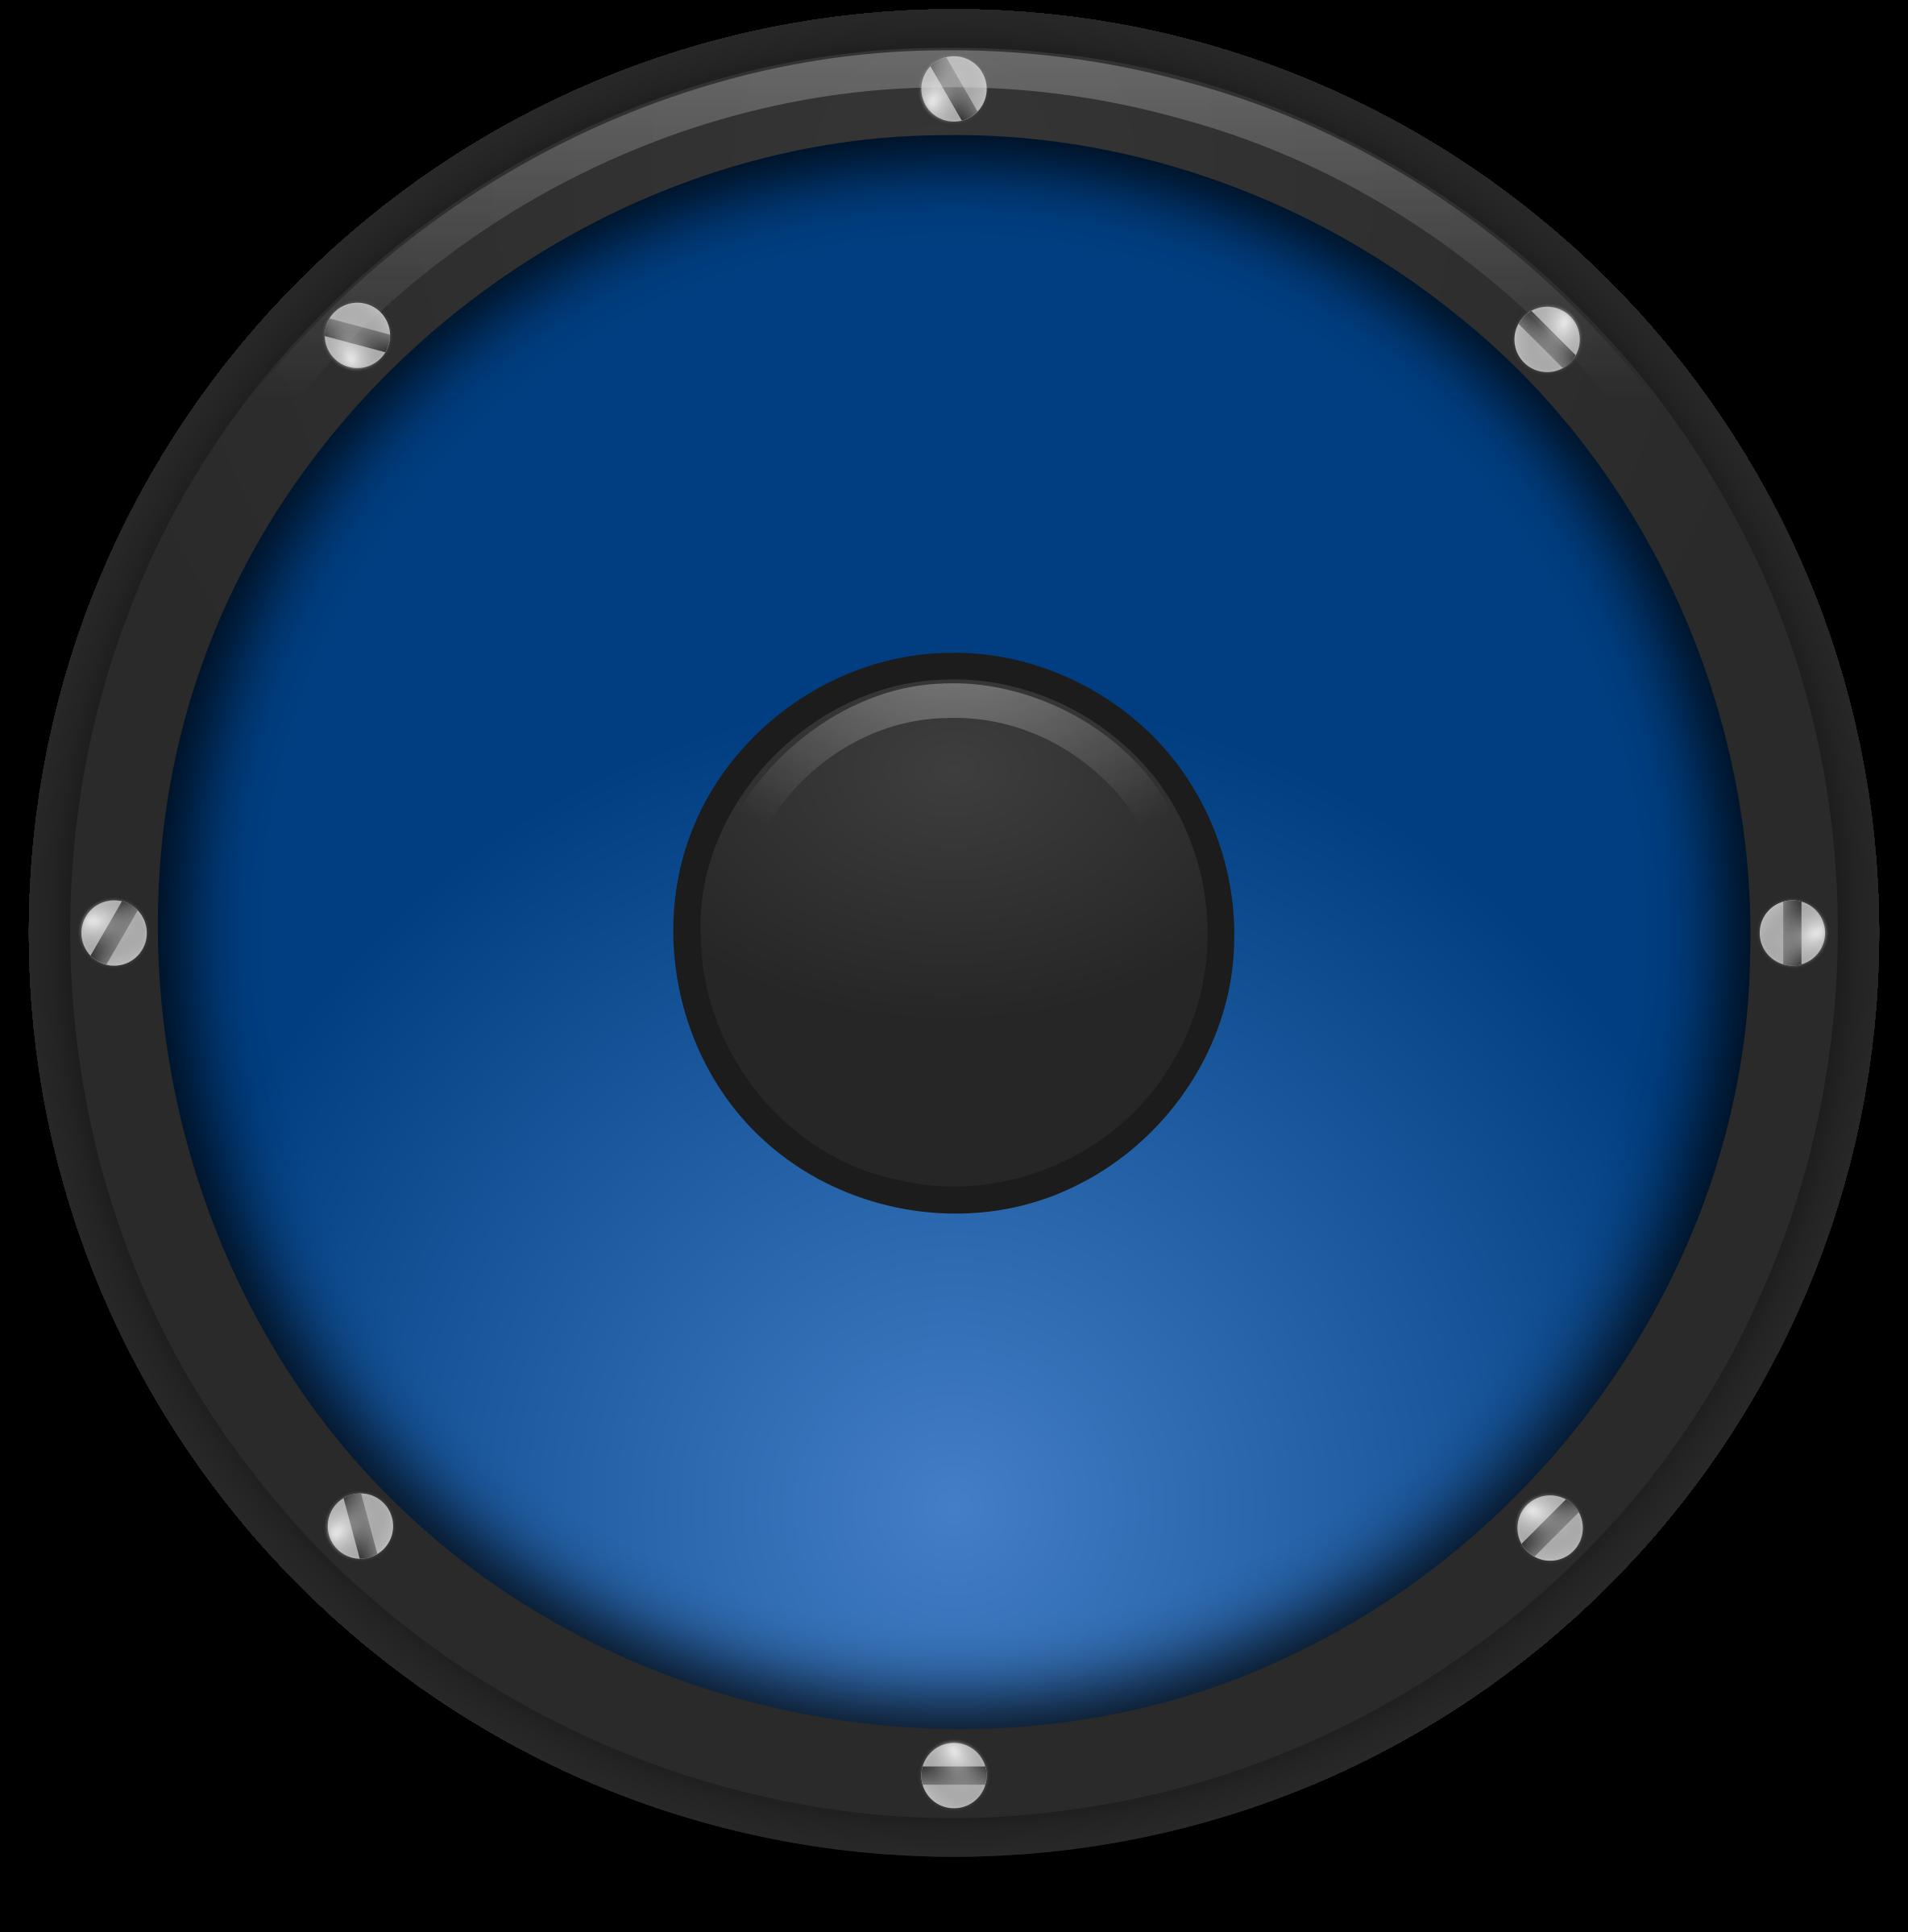 Car speaker clipart image royalty free download Clipart - speaker image royalty free download